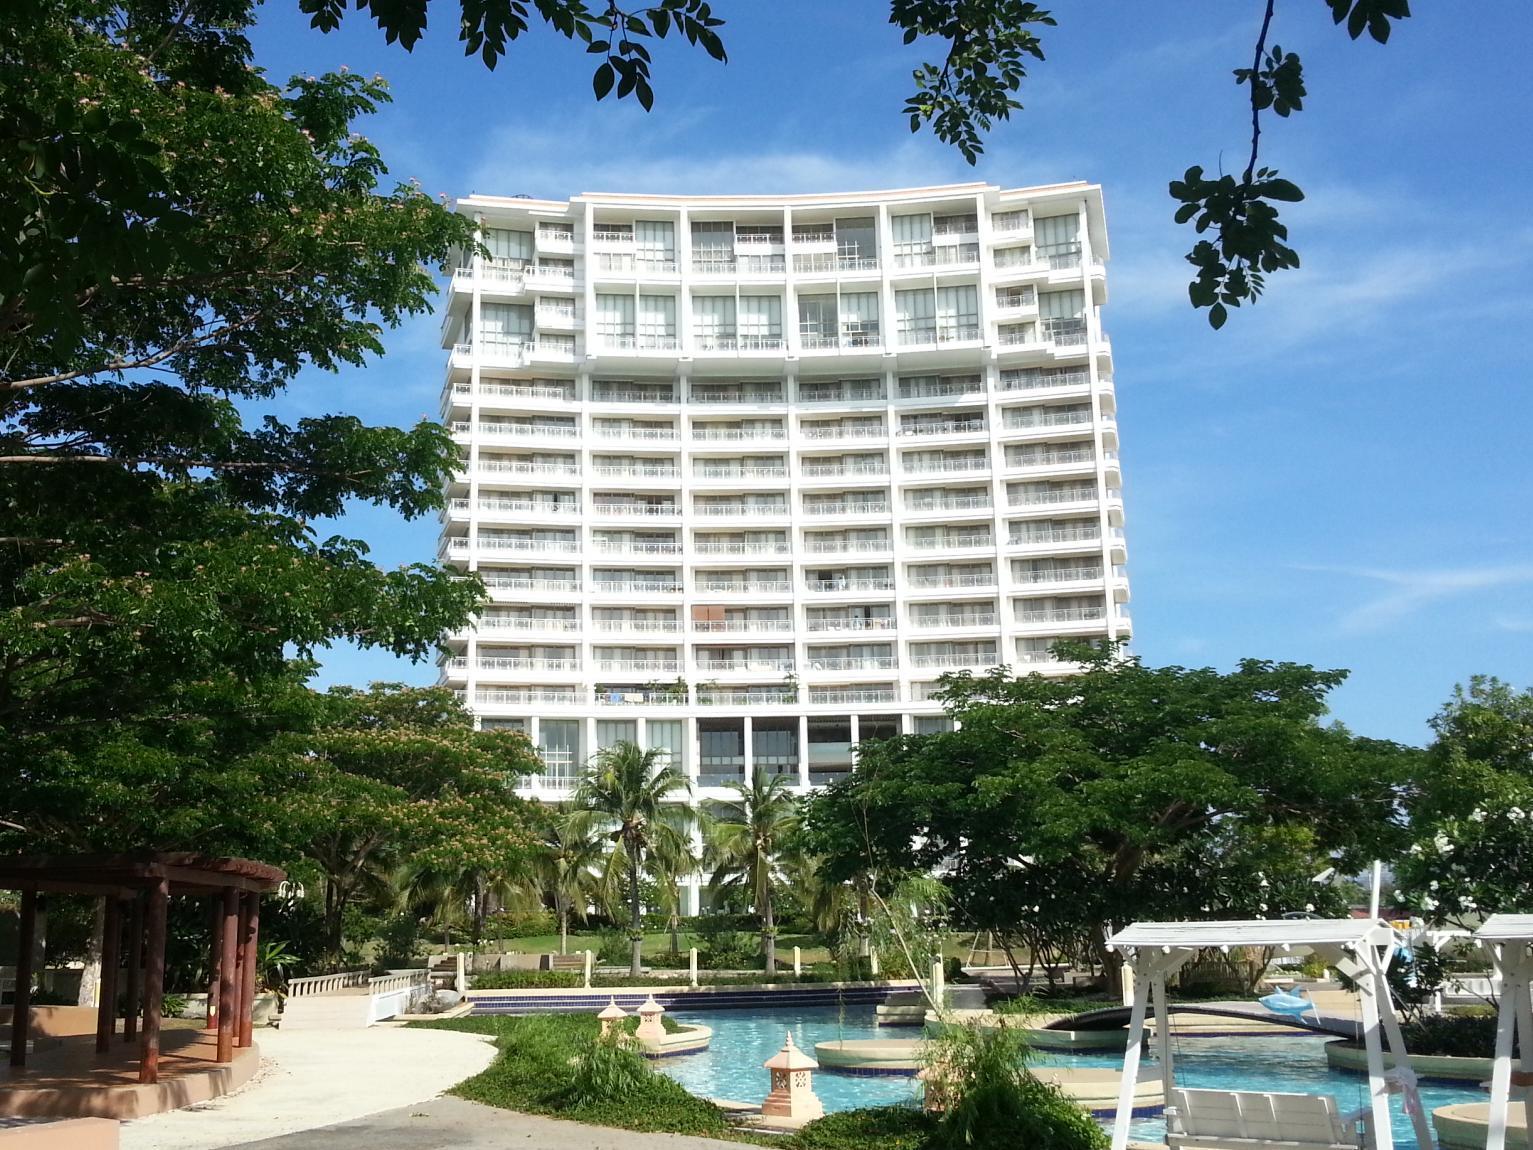 hua hin cha am hotels reservation rh accomreservation com